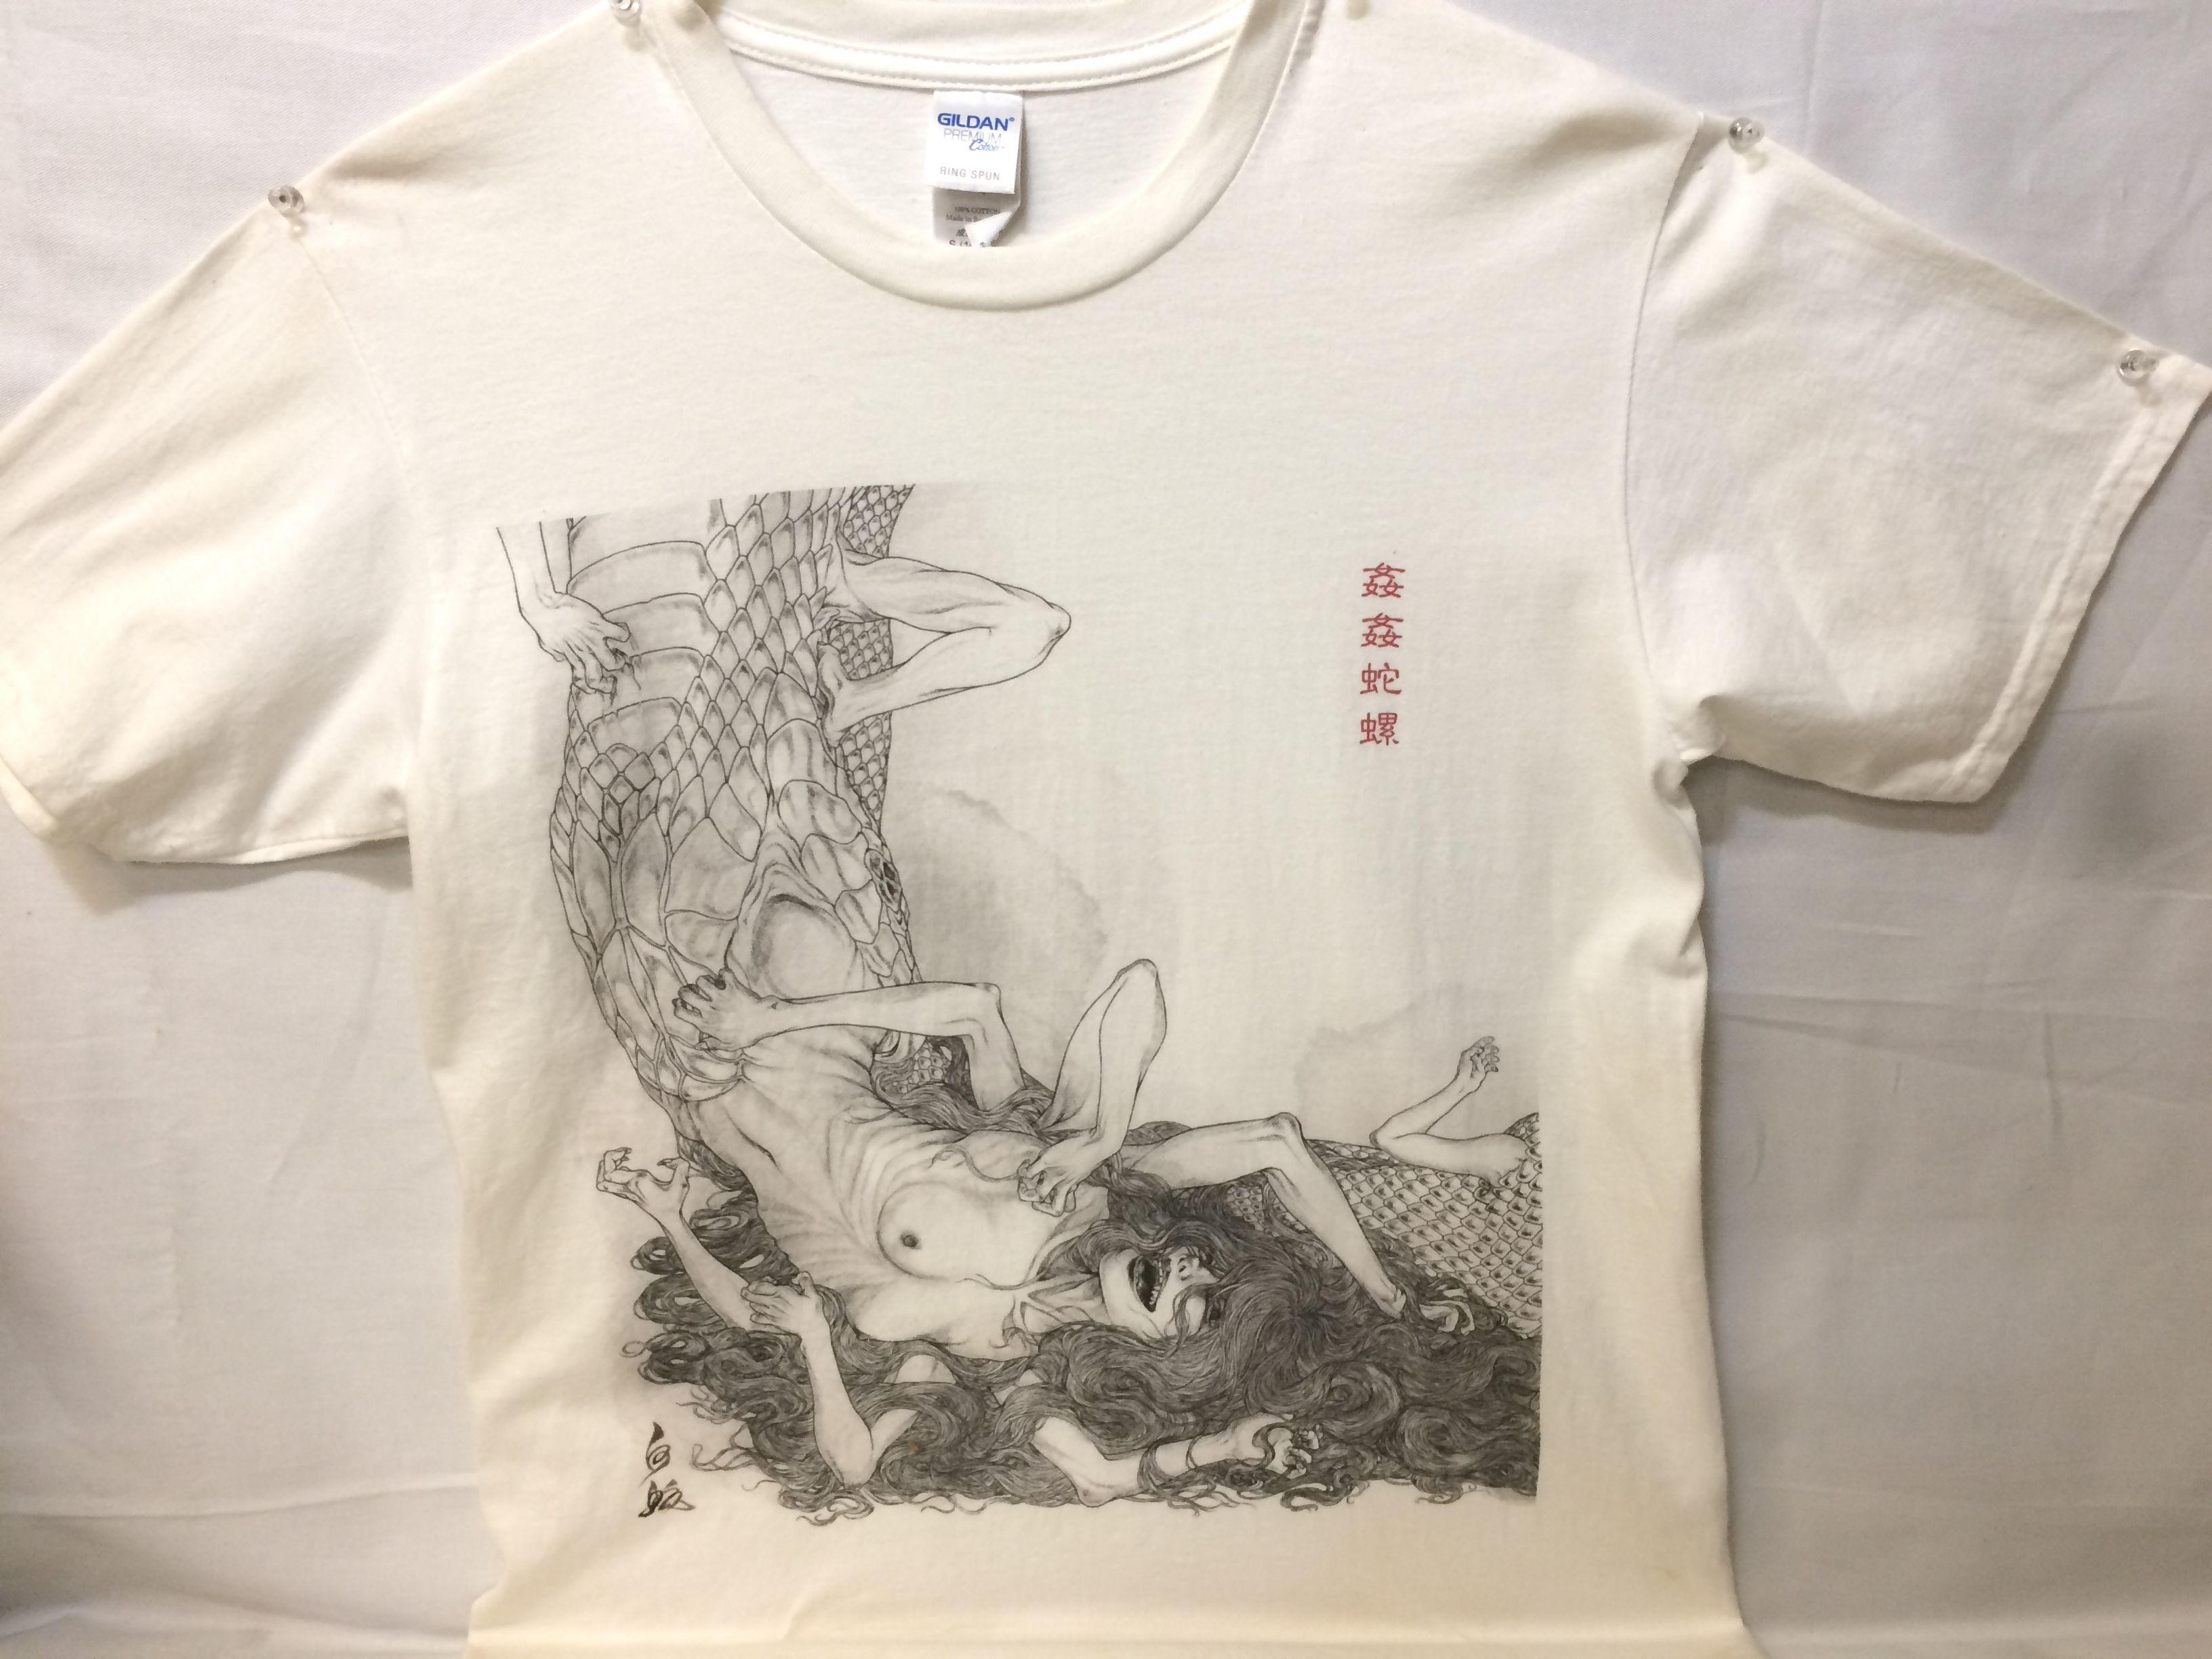 姦姦蛇螺Tシャツ 【身巳】画像